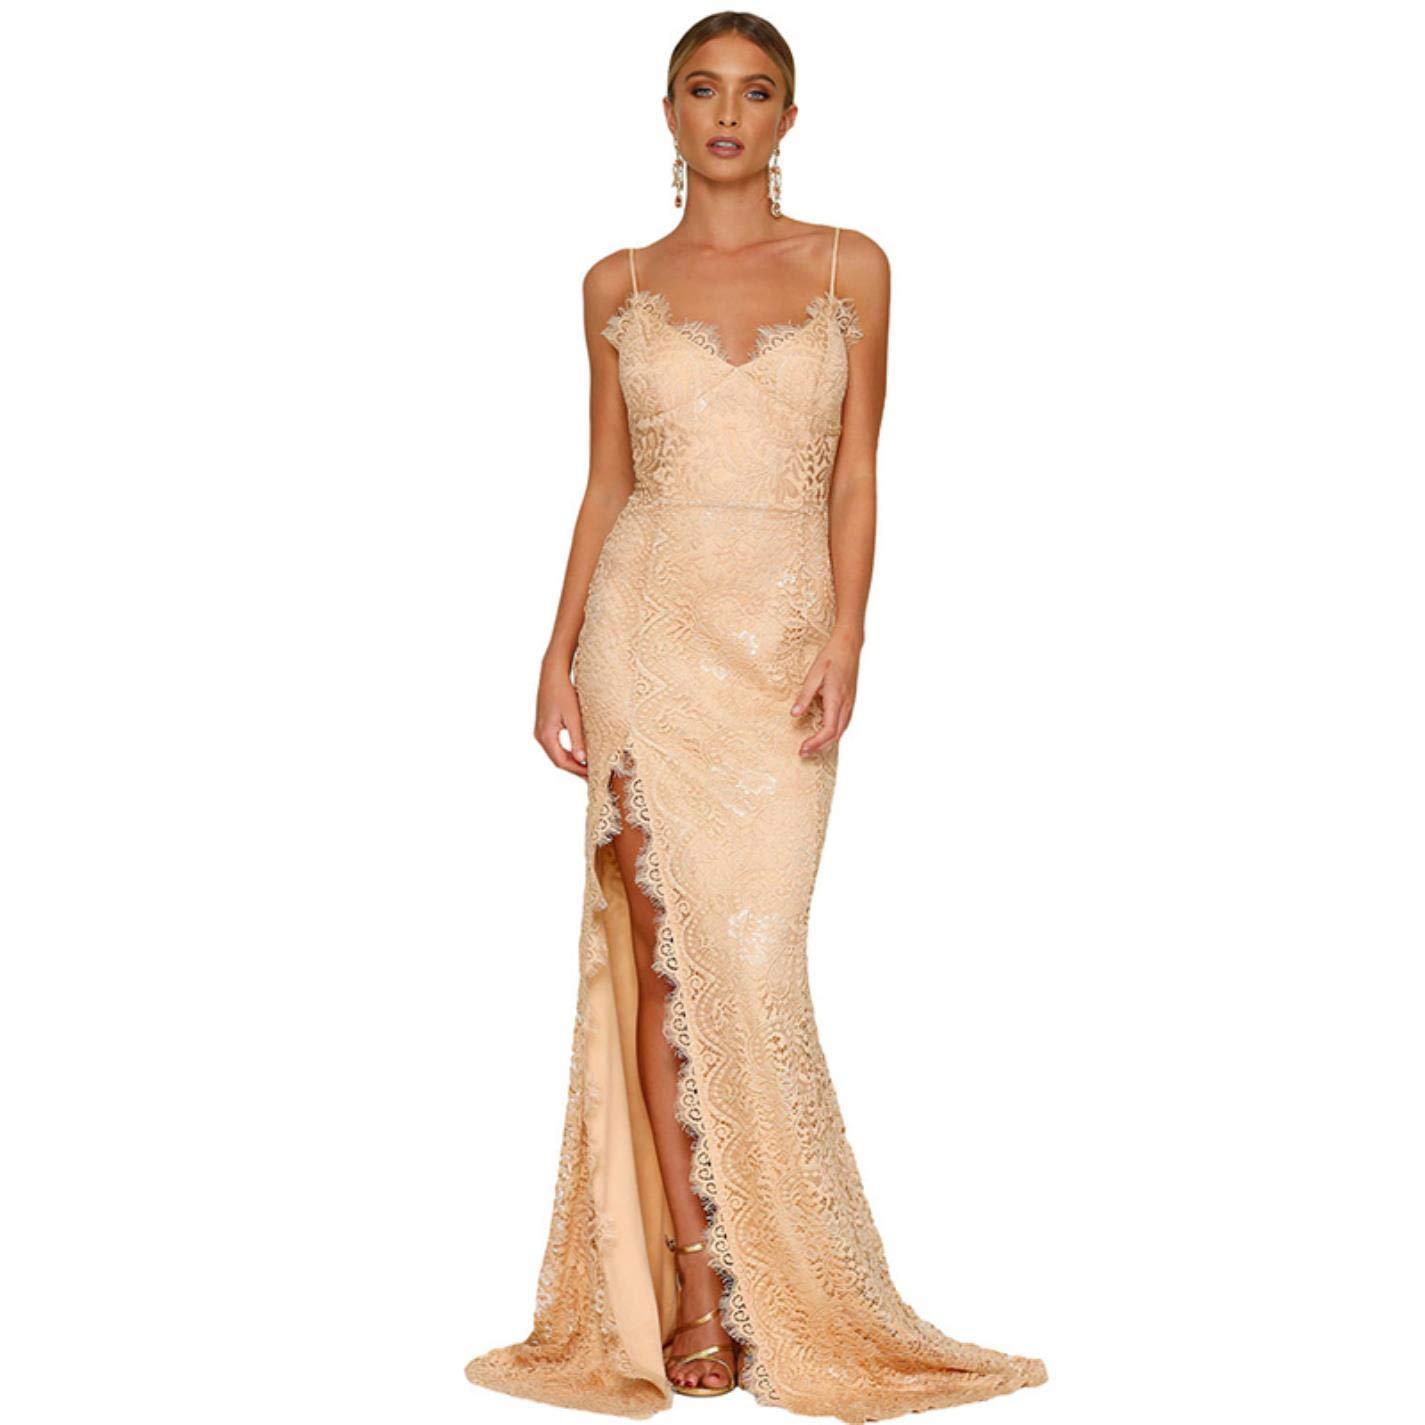 Khaki Party Dress pHeAEy Ladies Elegant Lace Long Evening Dress Sexy Party Dress Dress